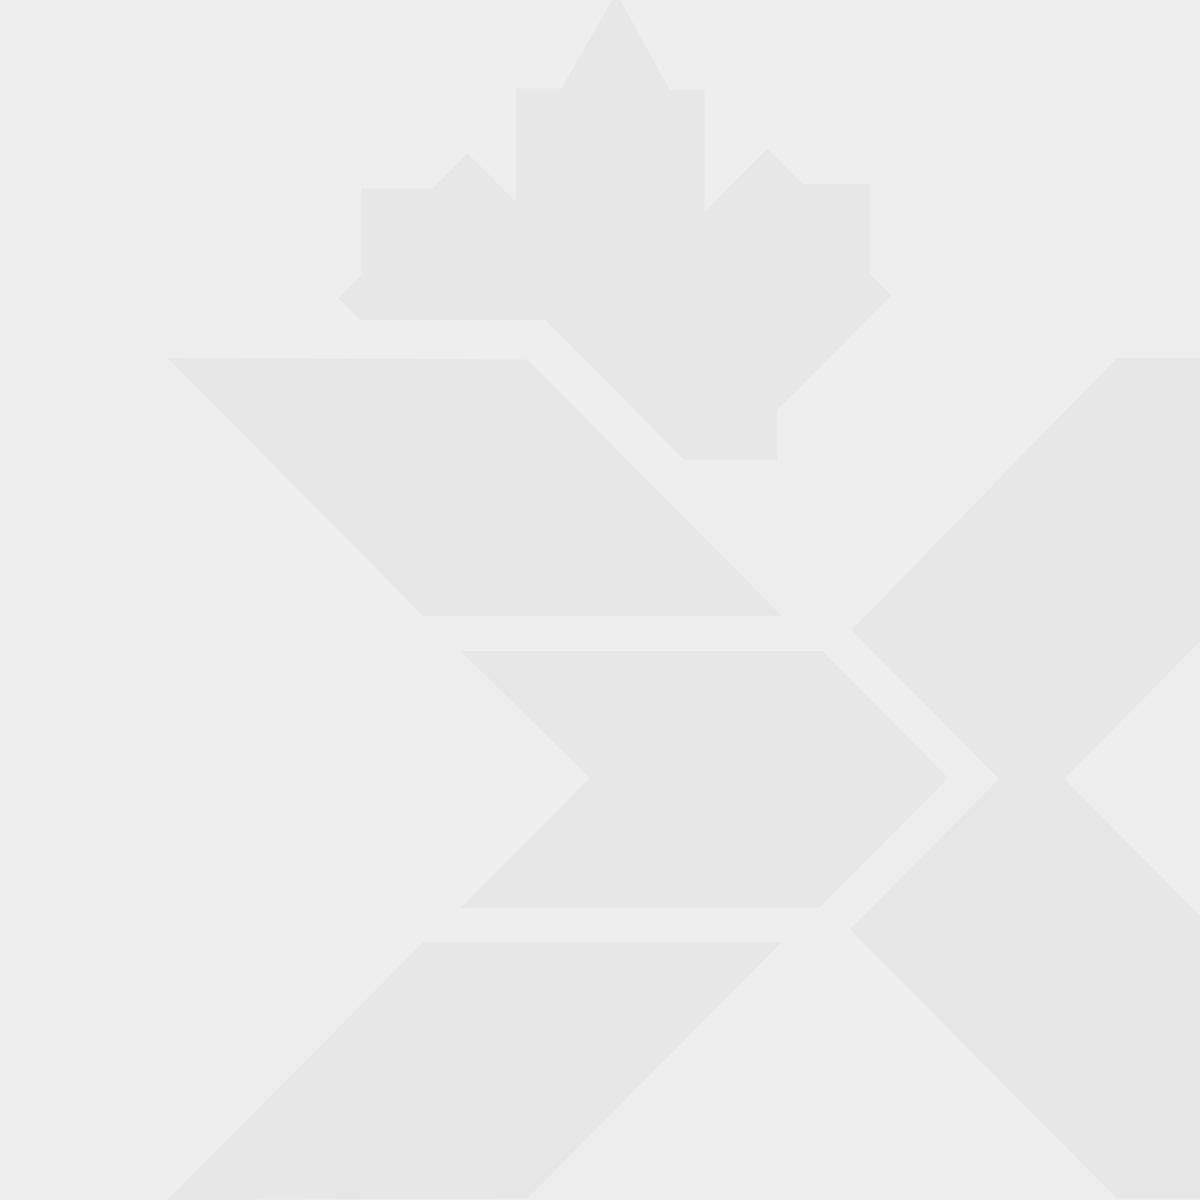 Royal Canadian Navy Men's 3 Pack Bilingual T-Shirts